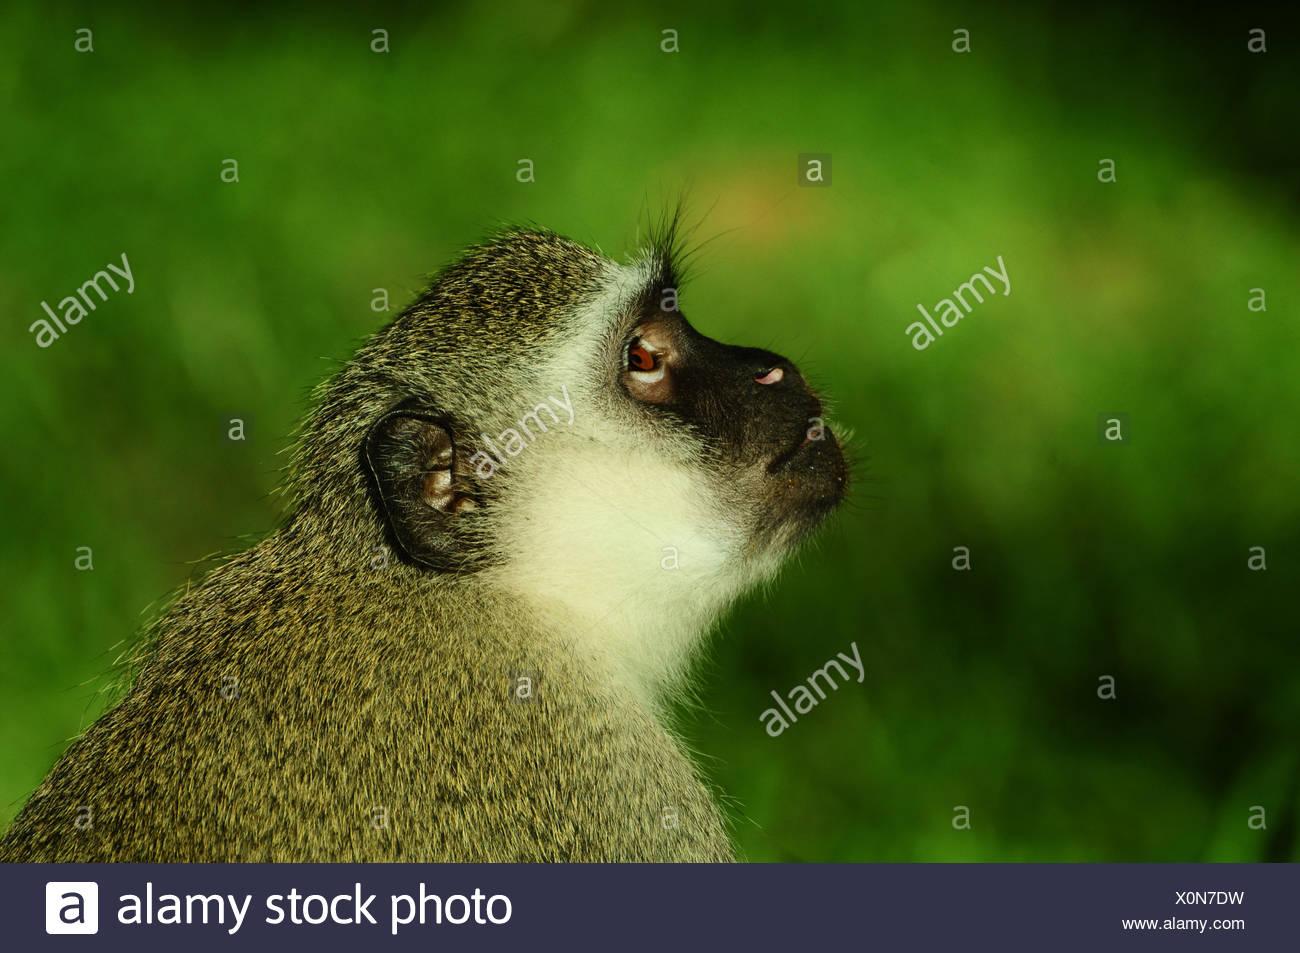 Vervet Monkey South Africa - Stock Image